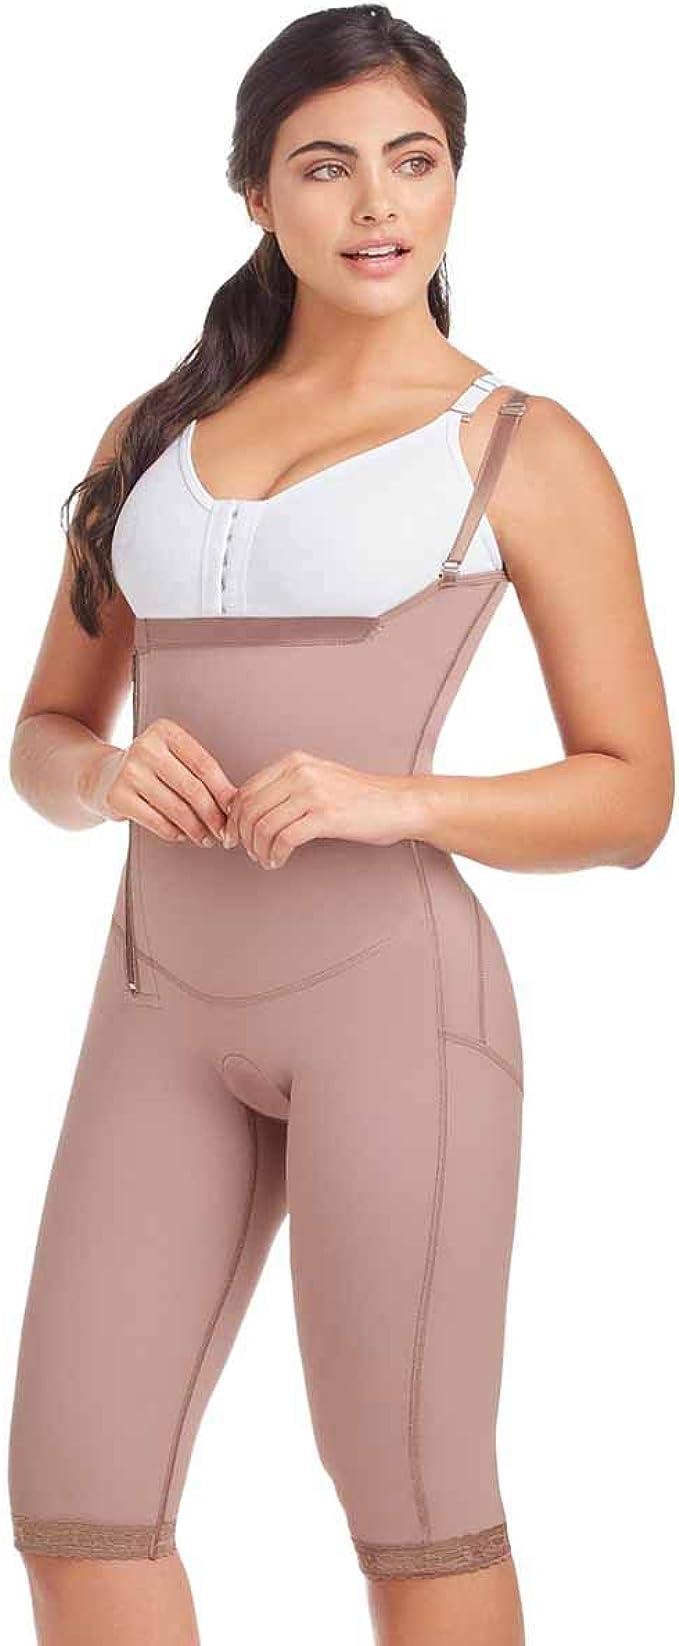 DPrada 021 Shapewear Body Liposuction Compression Garments Post Surgery Faja